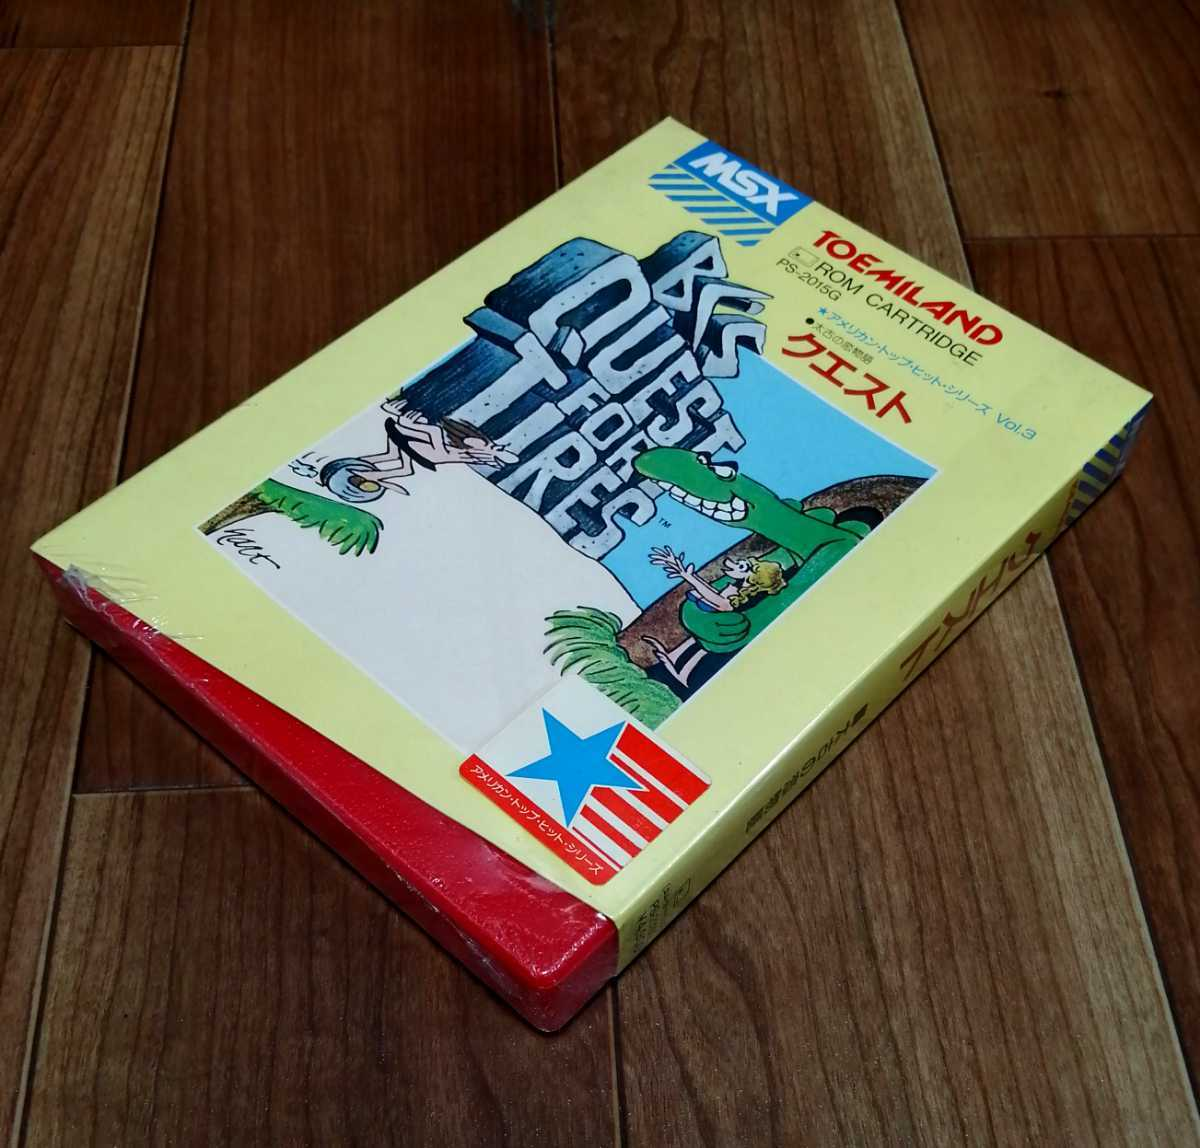 MSX クエスト 太古の恋物語 未開封品_画像1